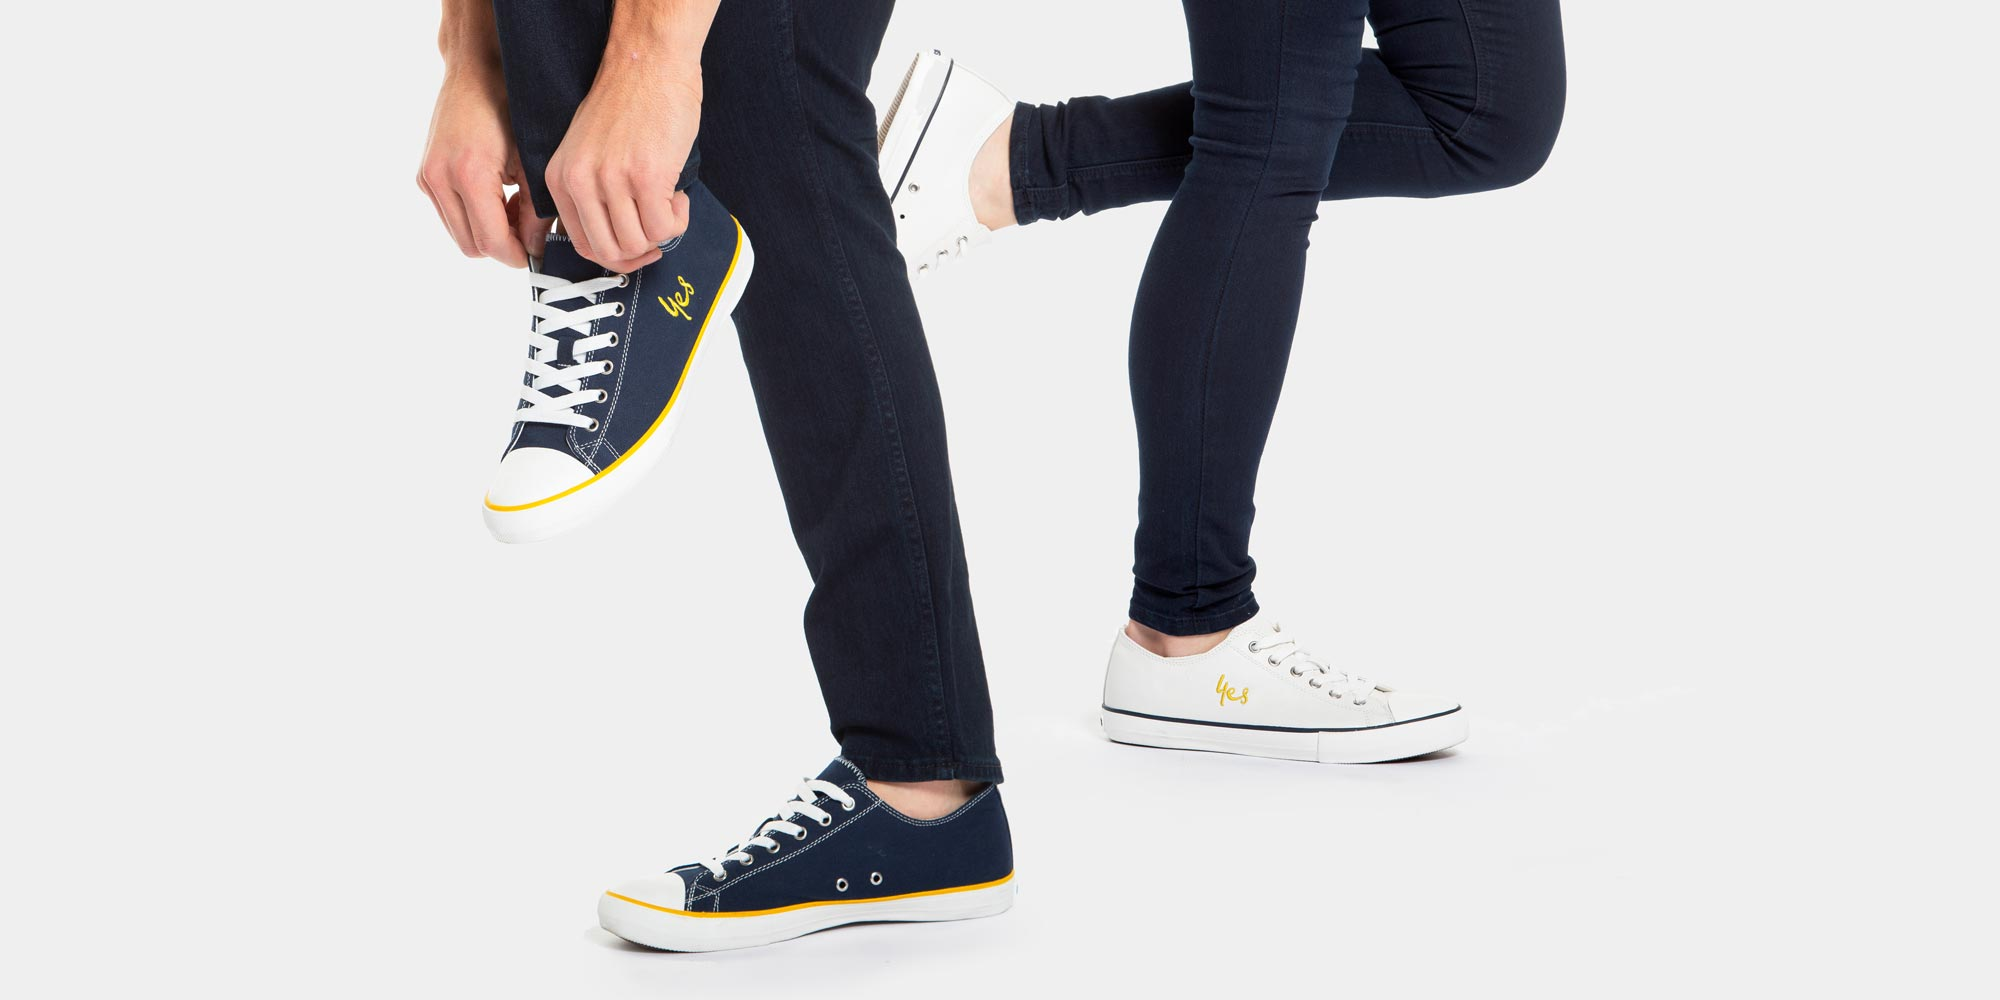 Custom Shoes for Australia's Favourite Telco